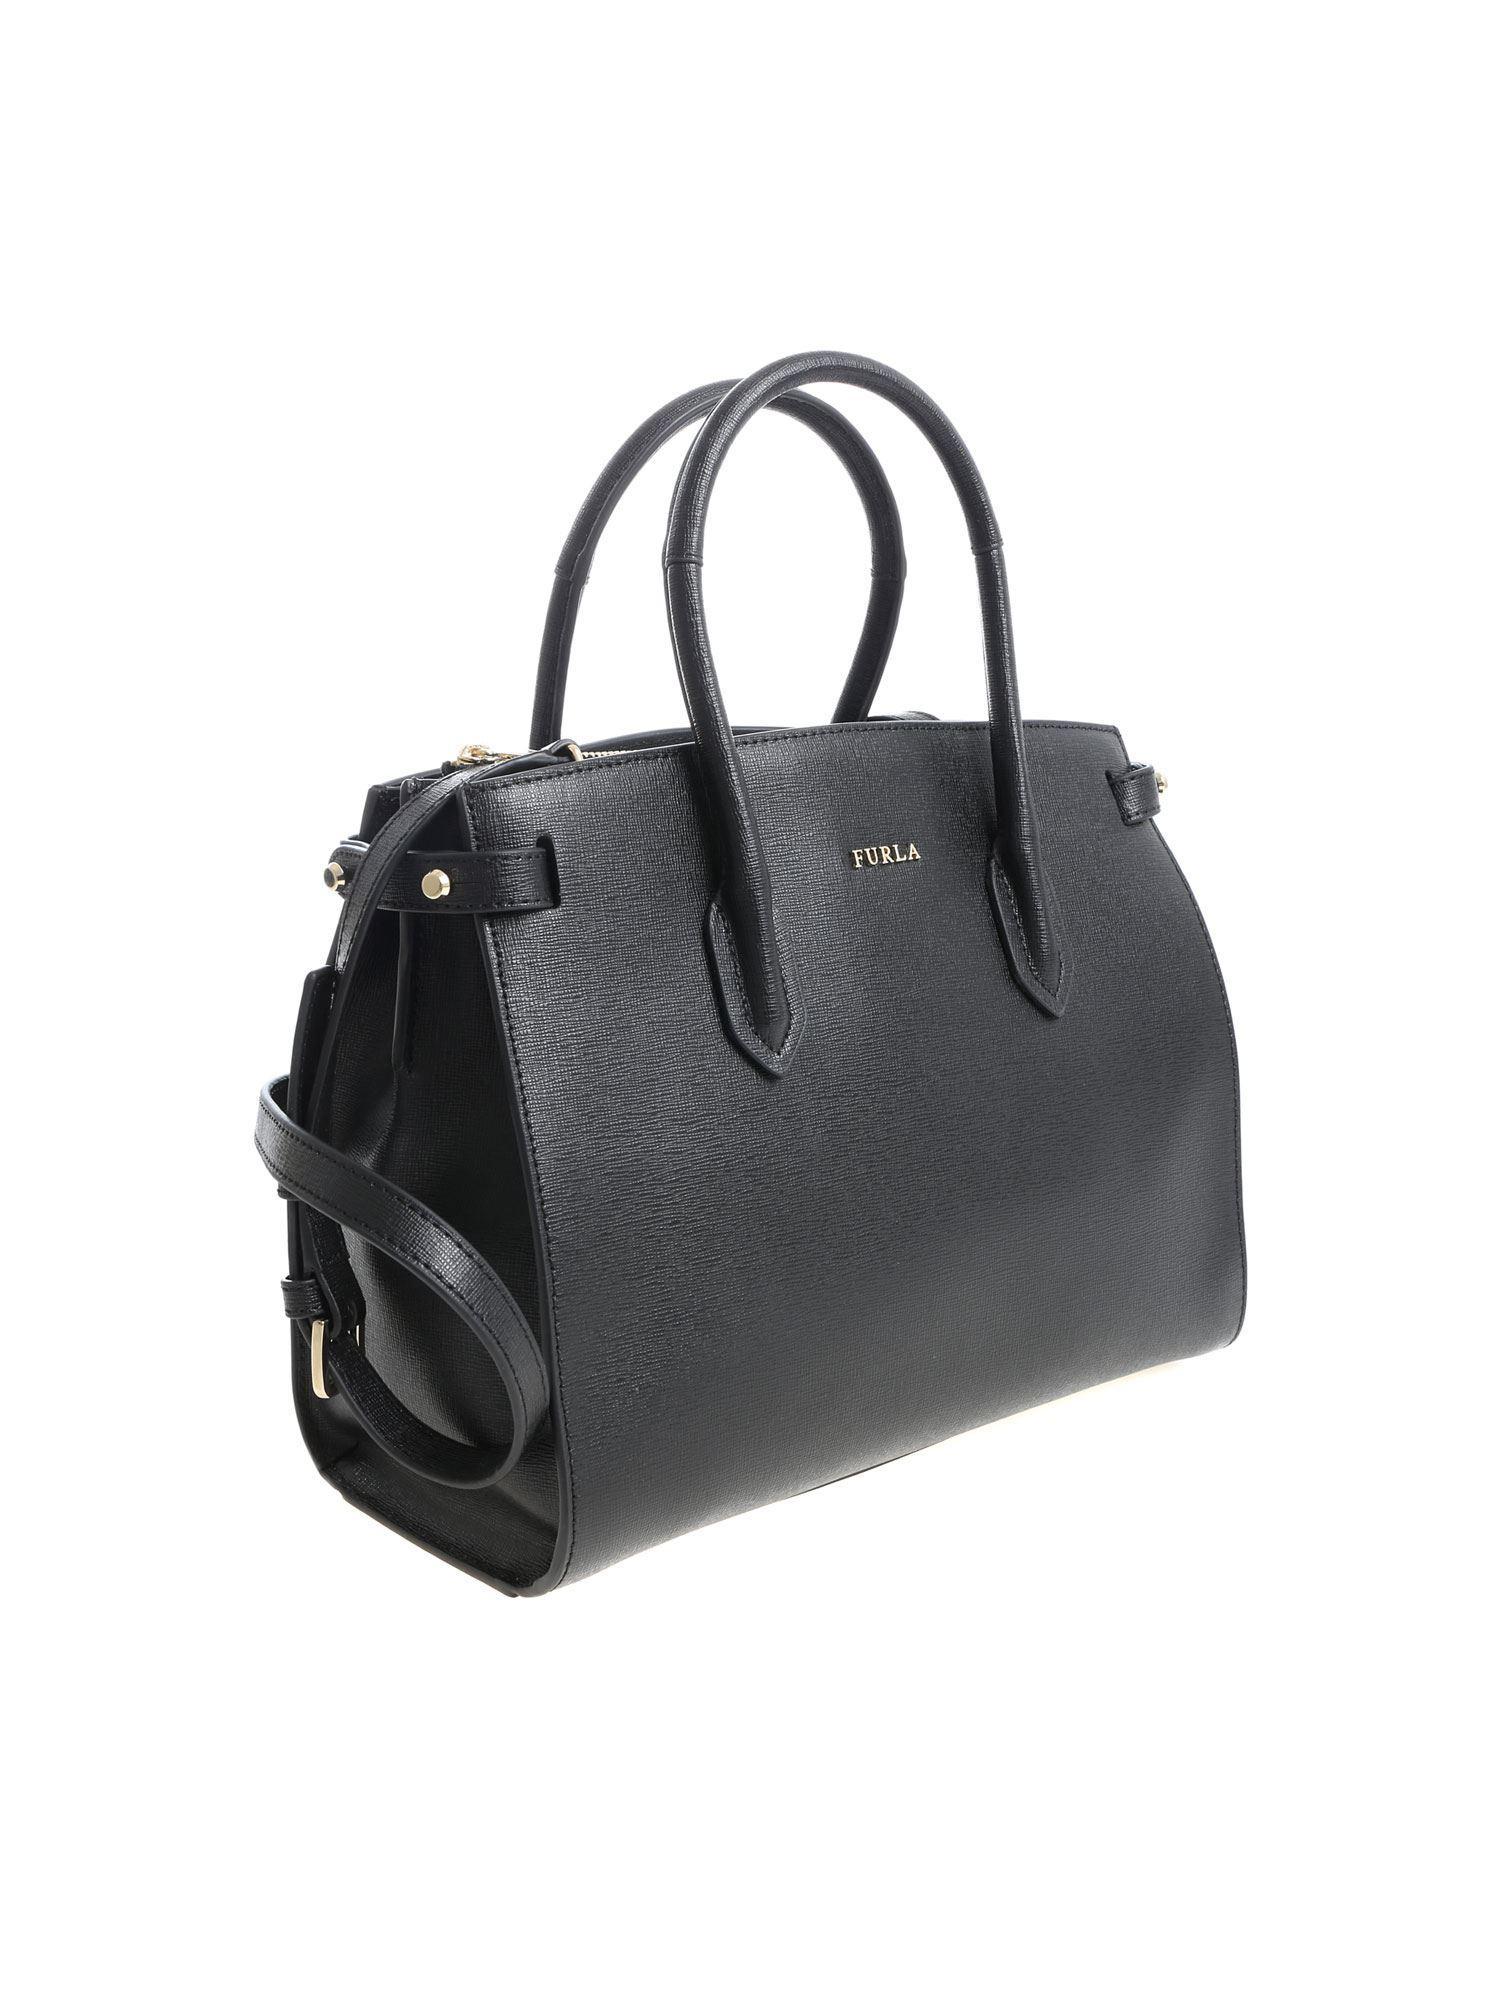 Pin Furla Handbag In Black Lyst Jc3FK1Tl